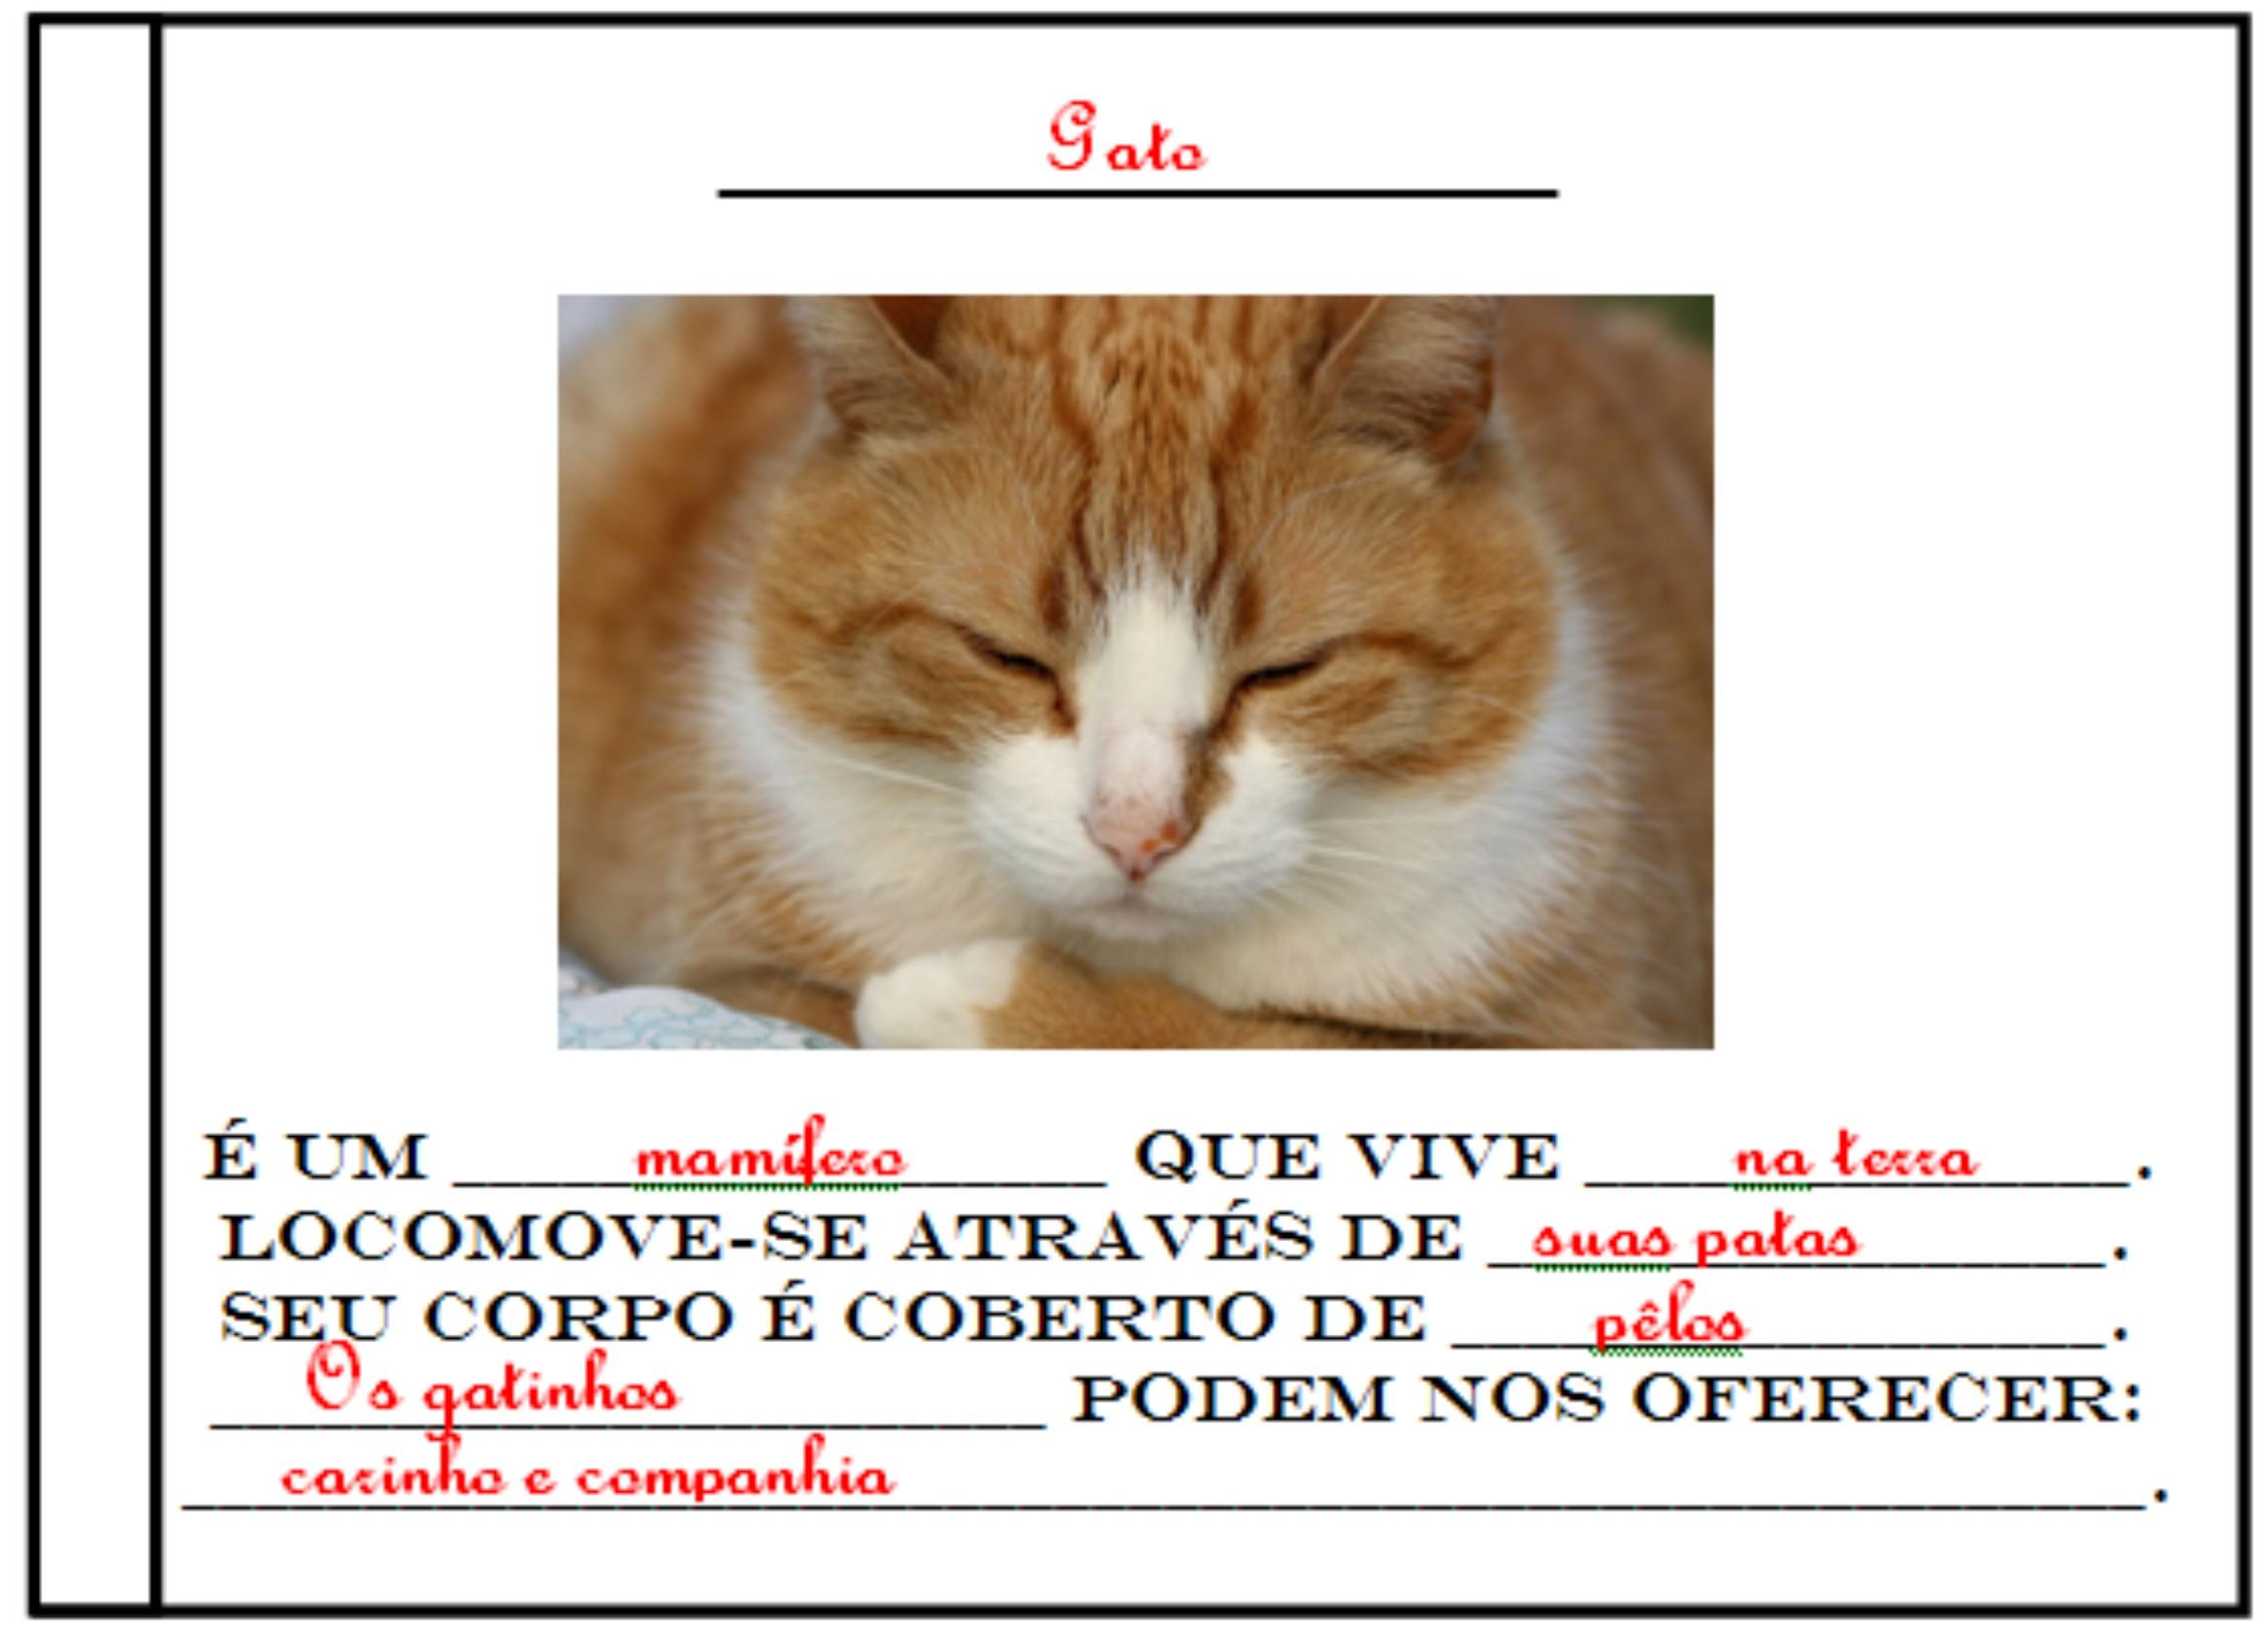 http://portaldoprofessor.mec.gov.br/storage/discovirtual/aulas/529/imagens/deondevemoleite2.jpg